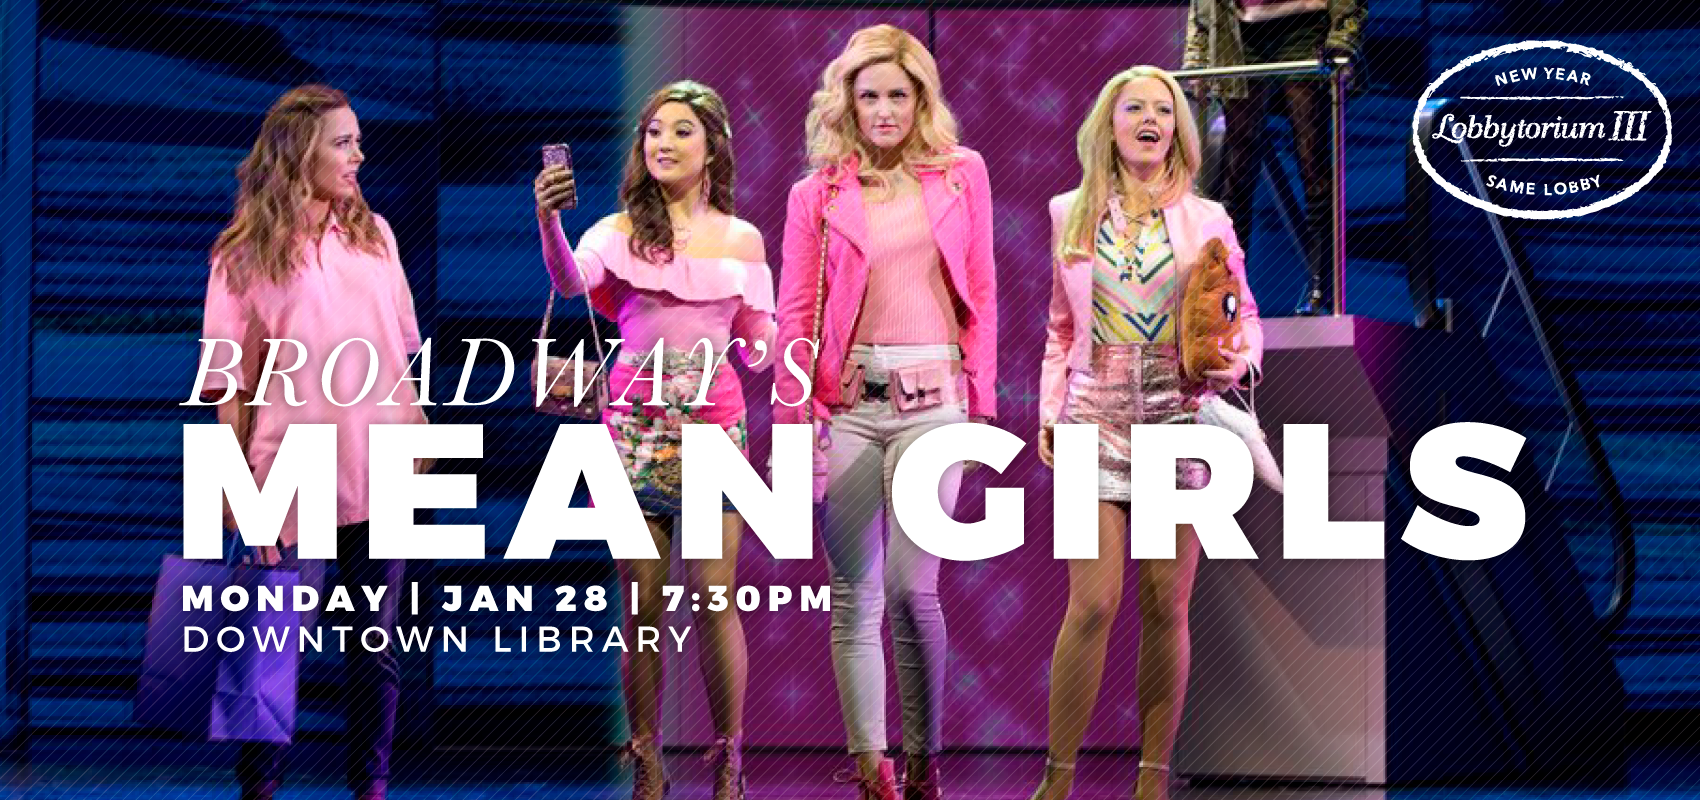 Mean Girls - Monday, Jan, 28. .